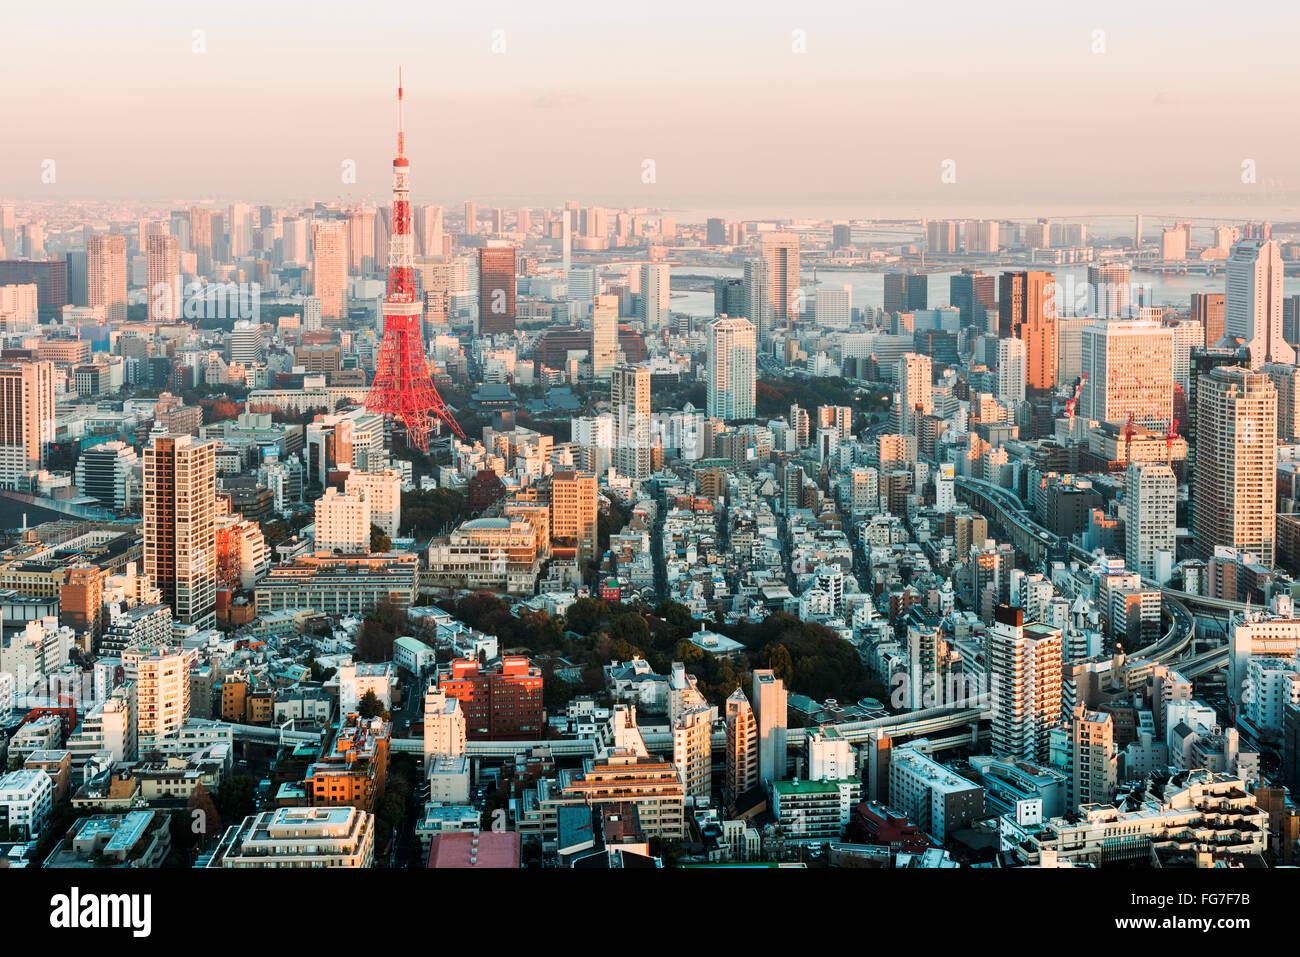 Tokyo, Japan - January 14, 2016: Tokyo Skyline at sunset. Stock Photo